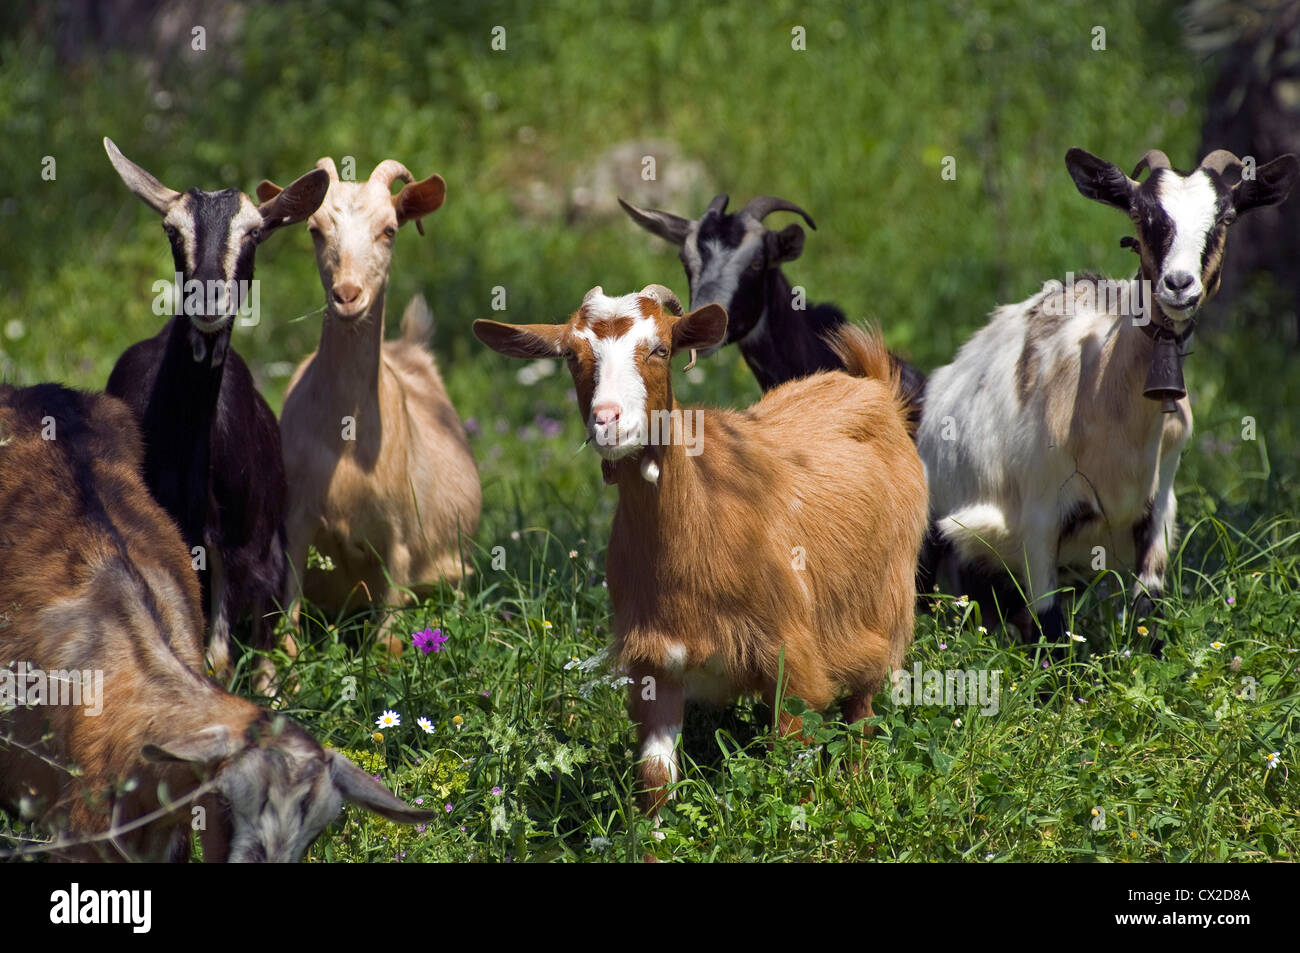 Grazing flock of goats Stock Photo